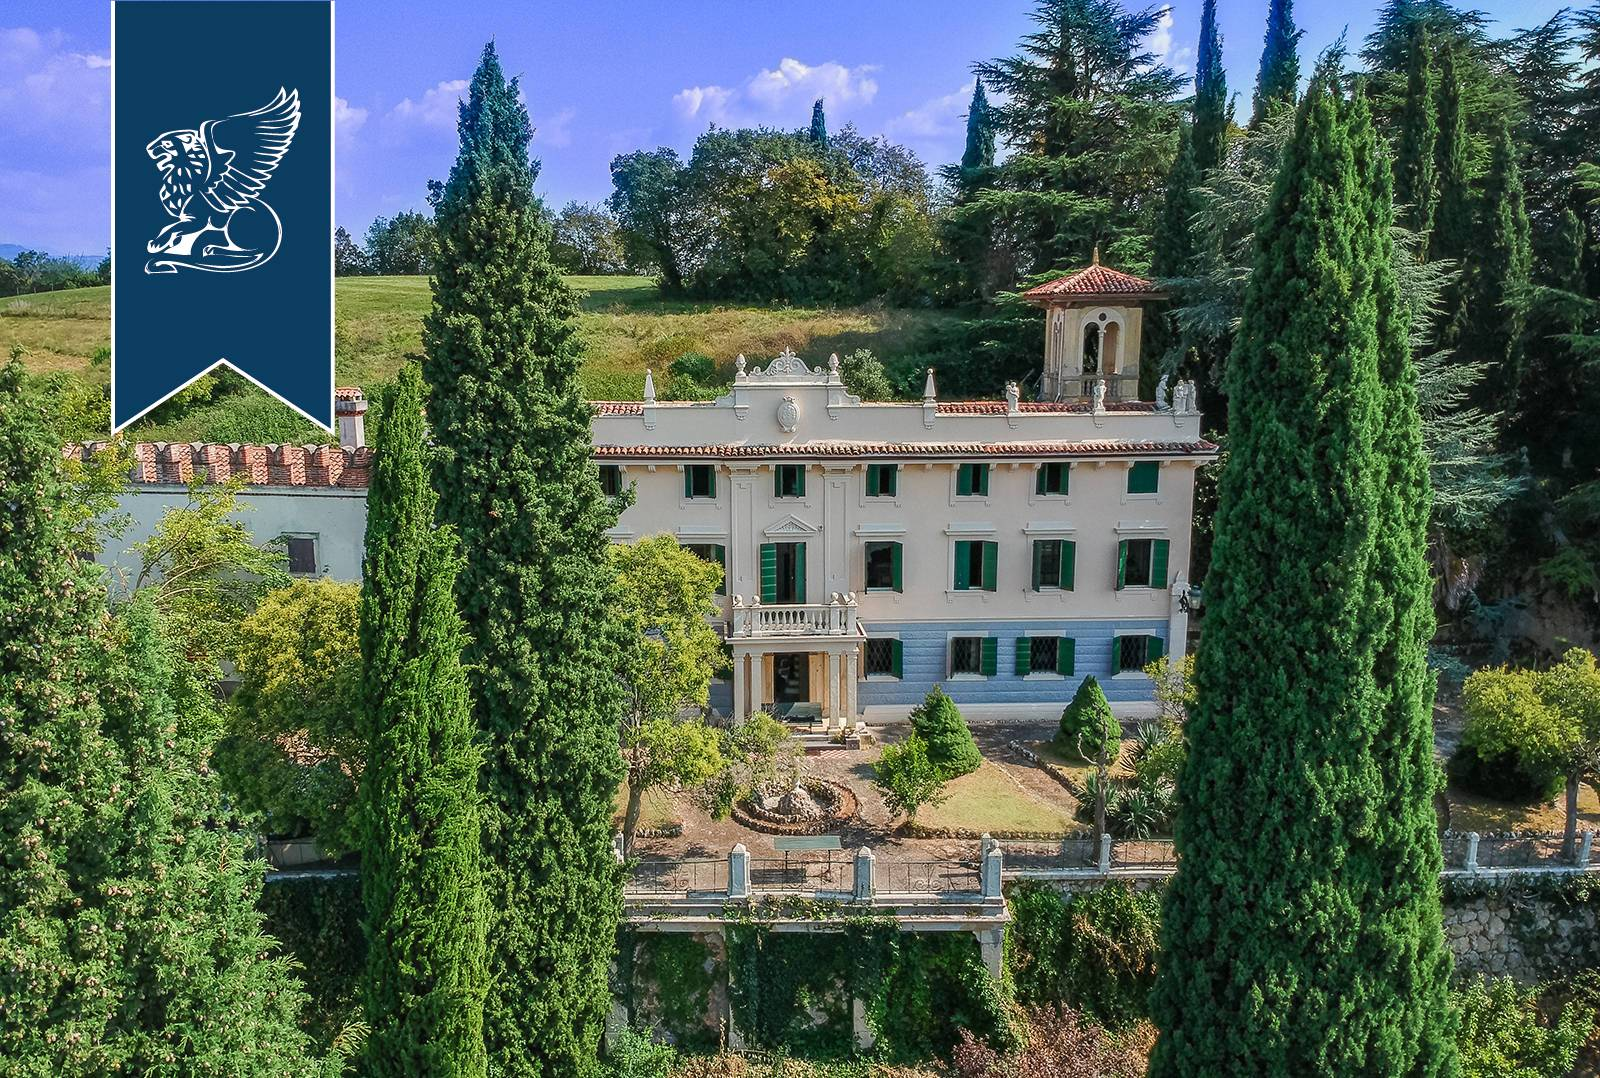 Villa in Vendita a Verona: 0 locali, 900 mq - Foto 4